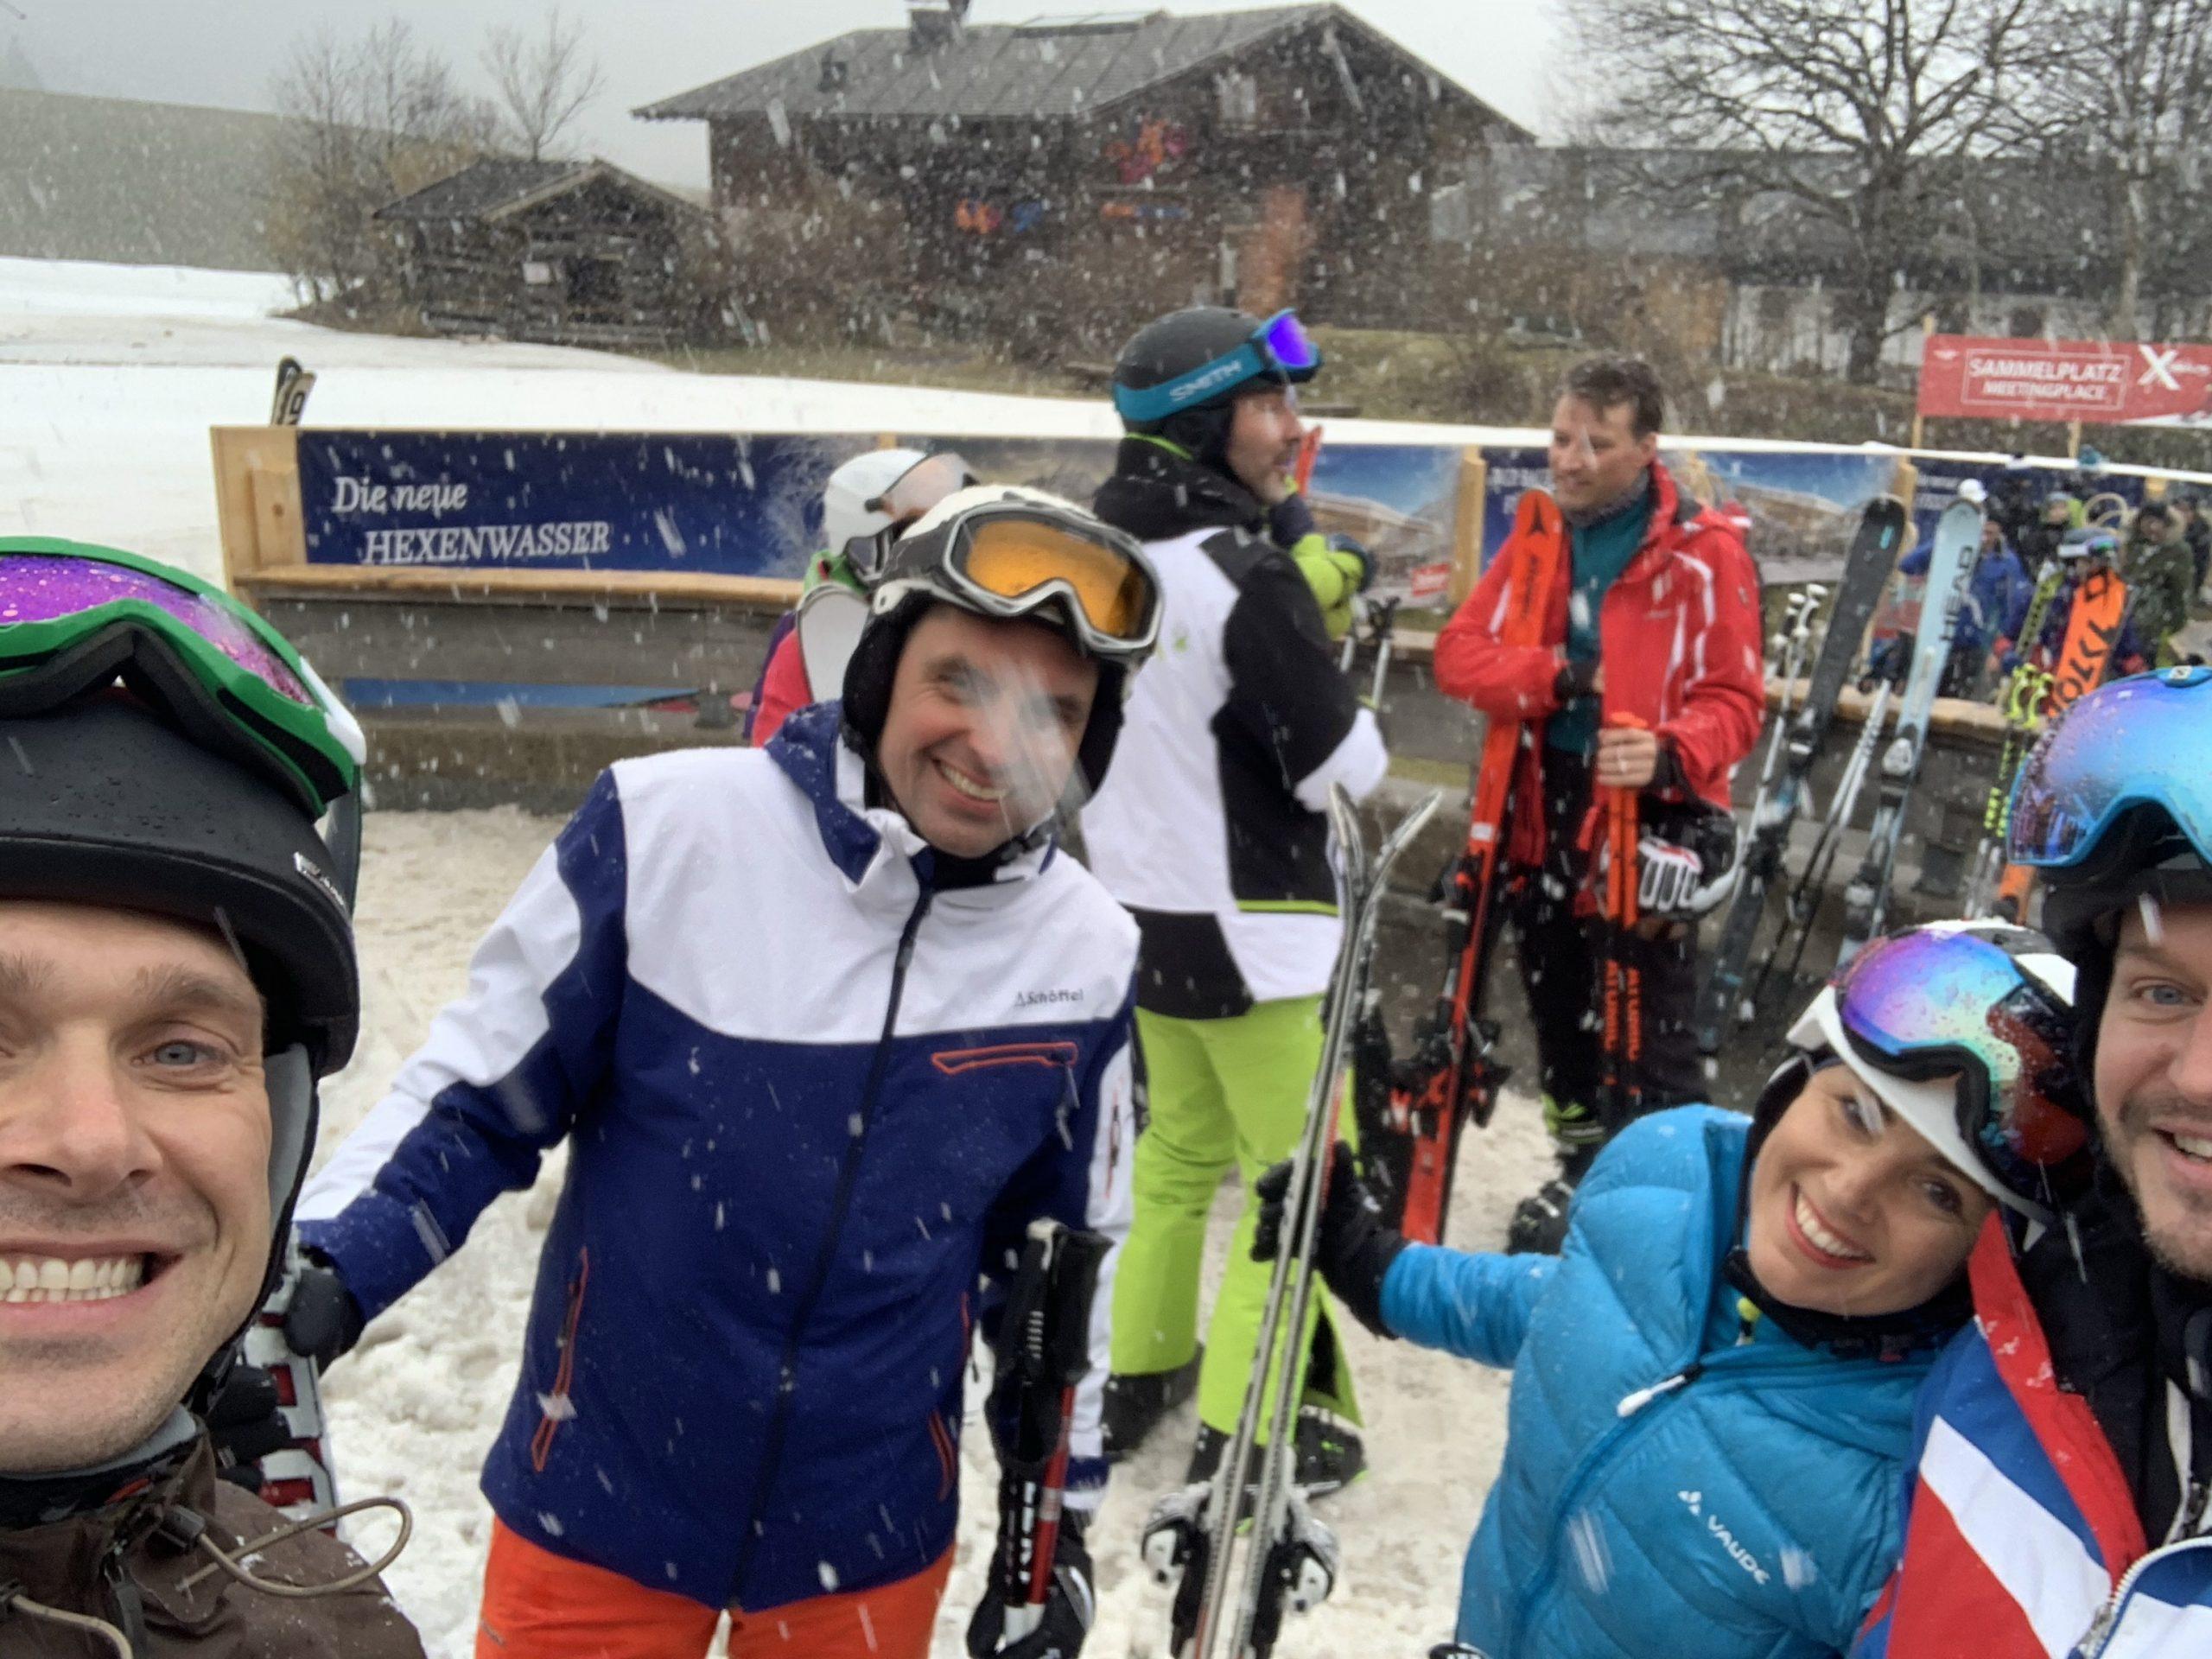 """TSV Kühbach meets Heimatsport"" - Skiausflug nach Söll/Wilder Kaiser"